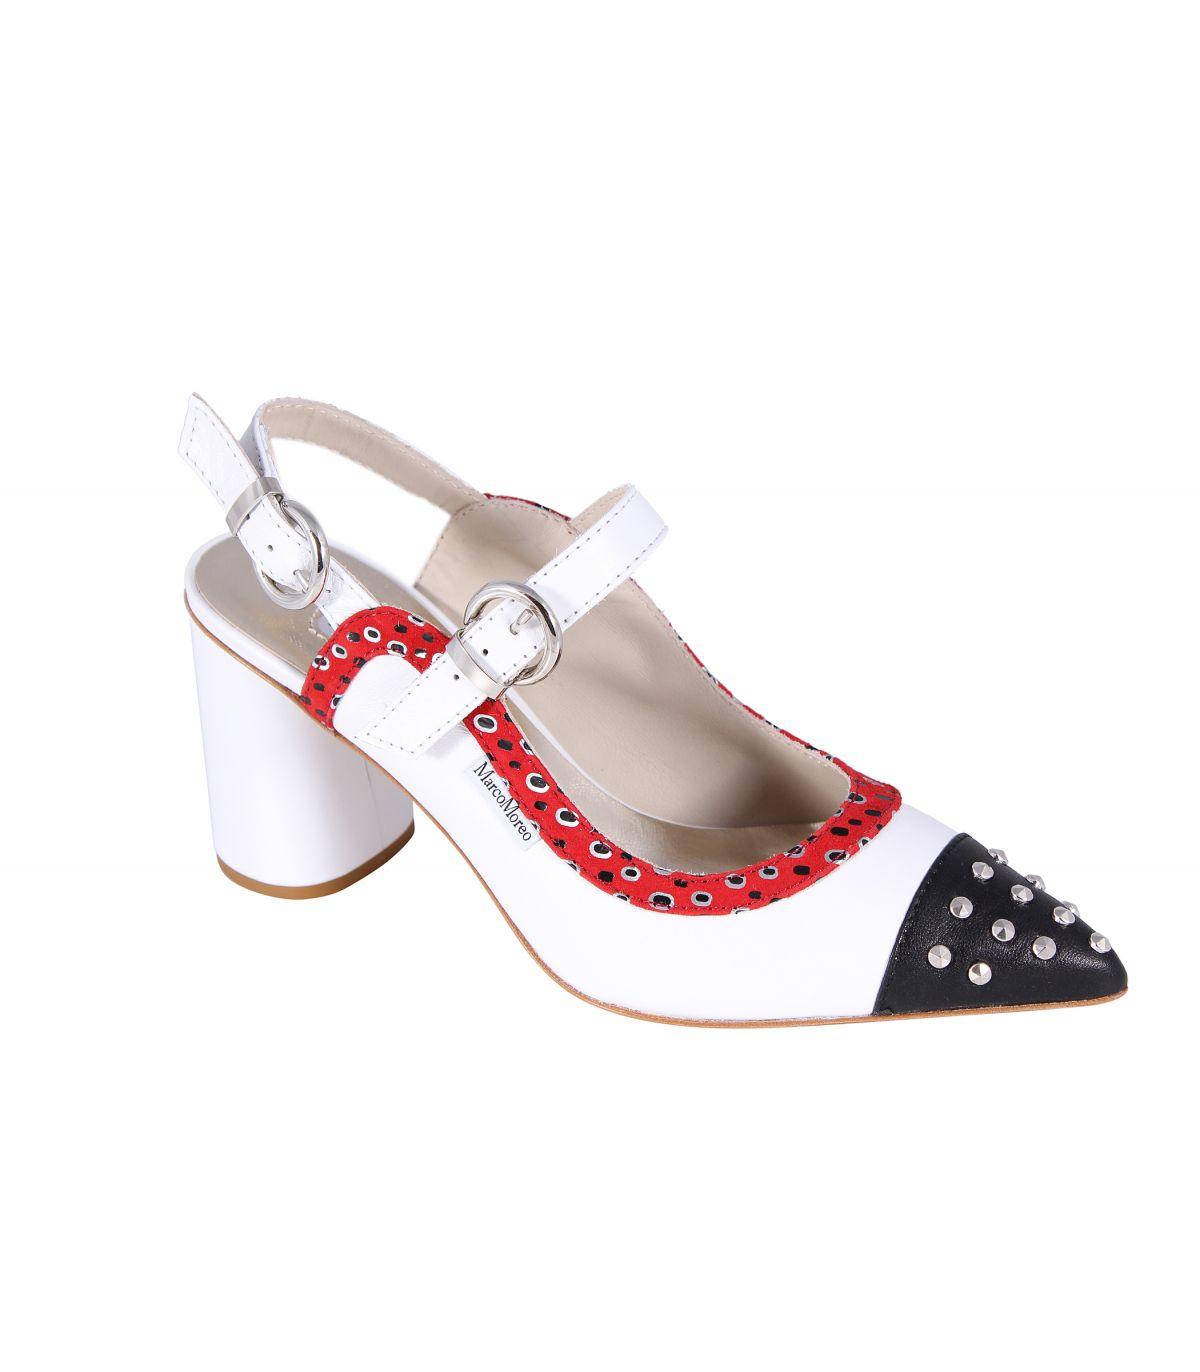 MARCO MOREO Marzia White Pointed Toe Sandal With Navy Toecap Image